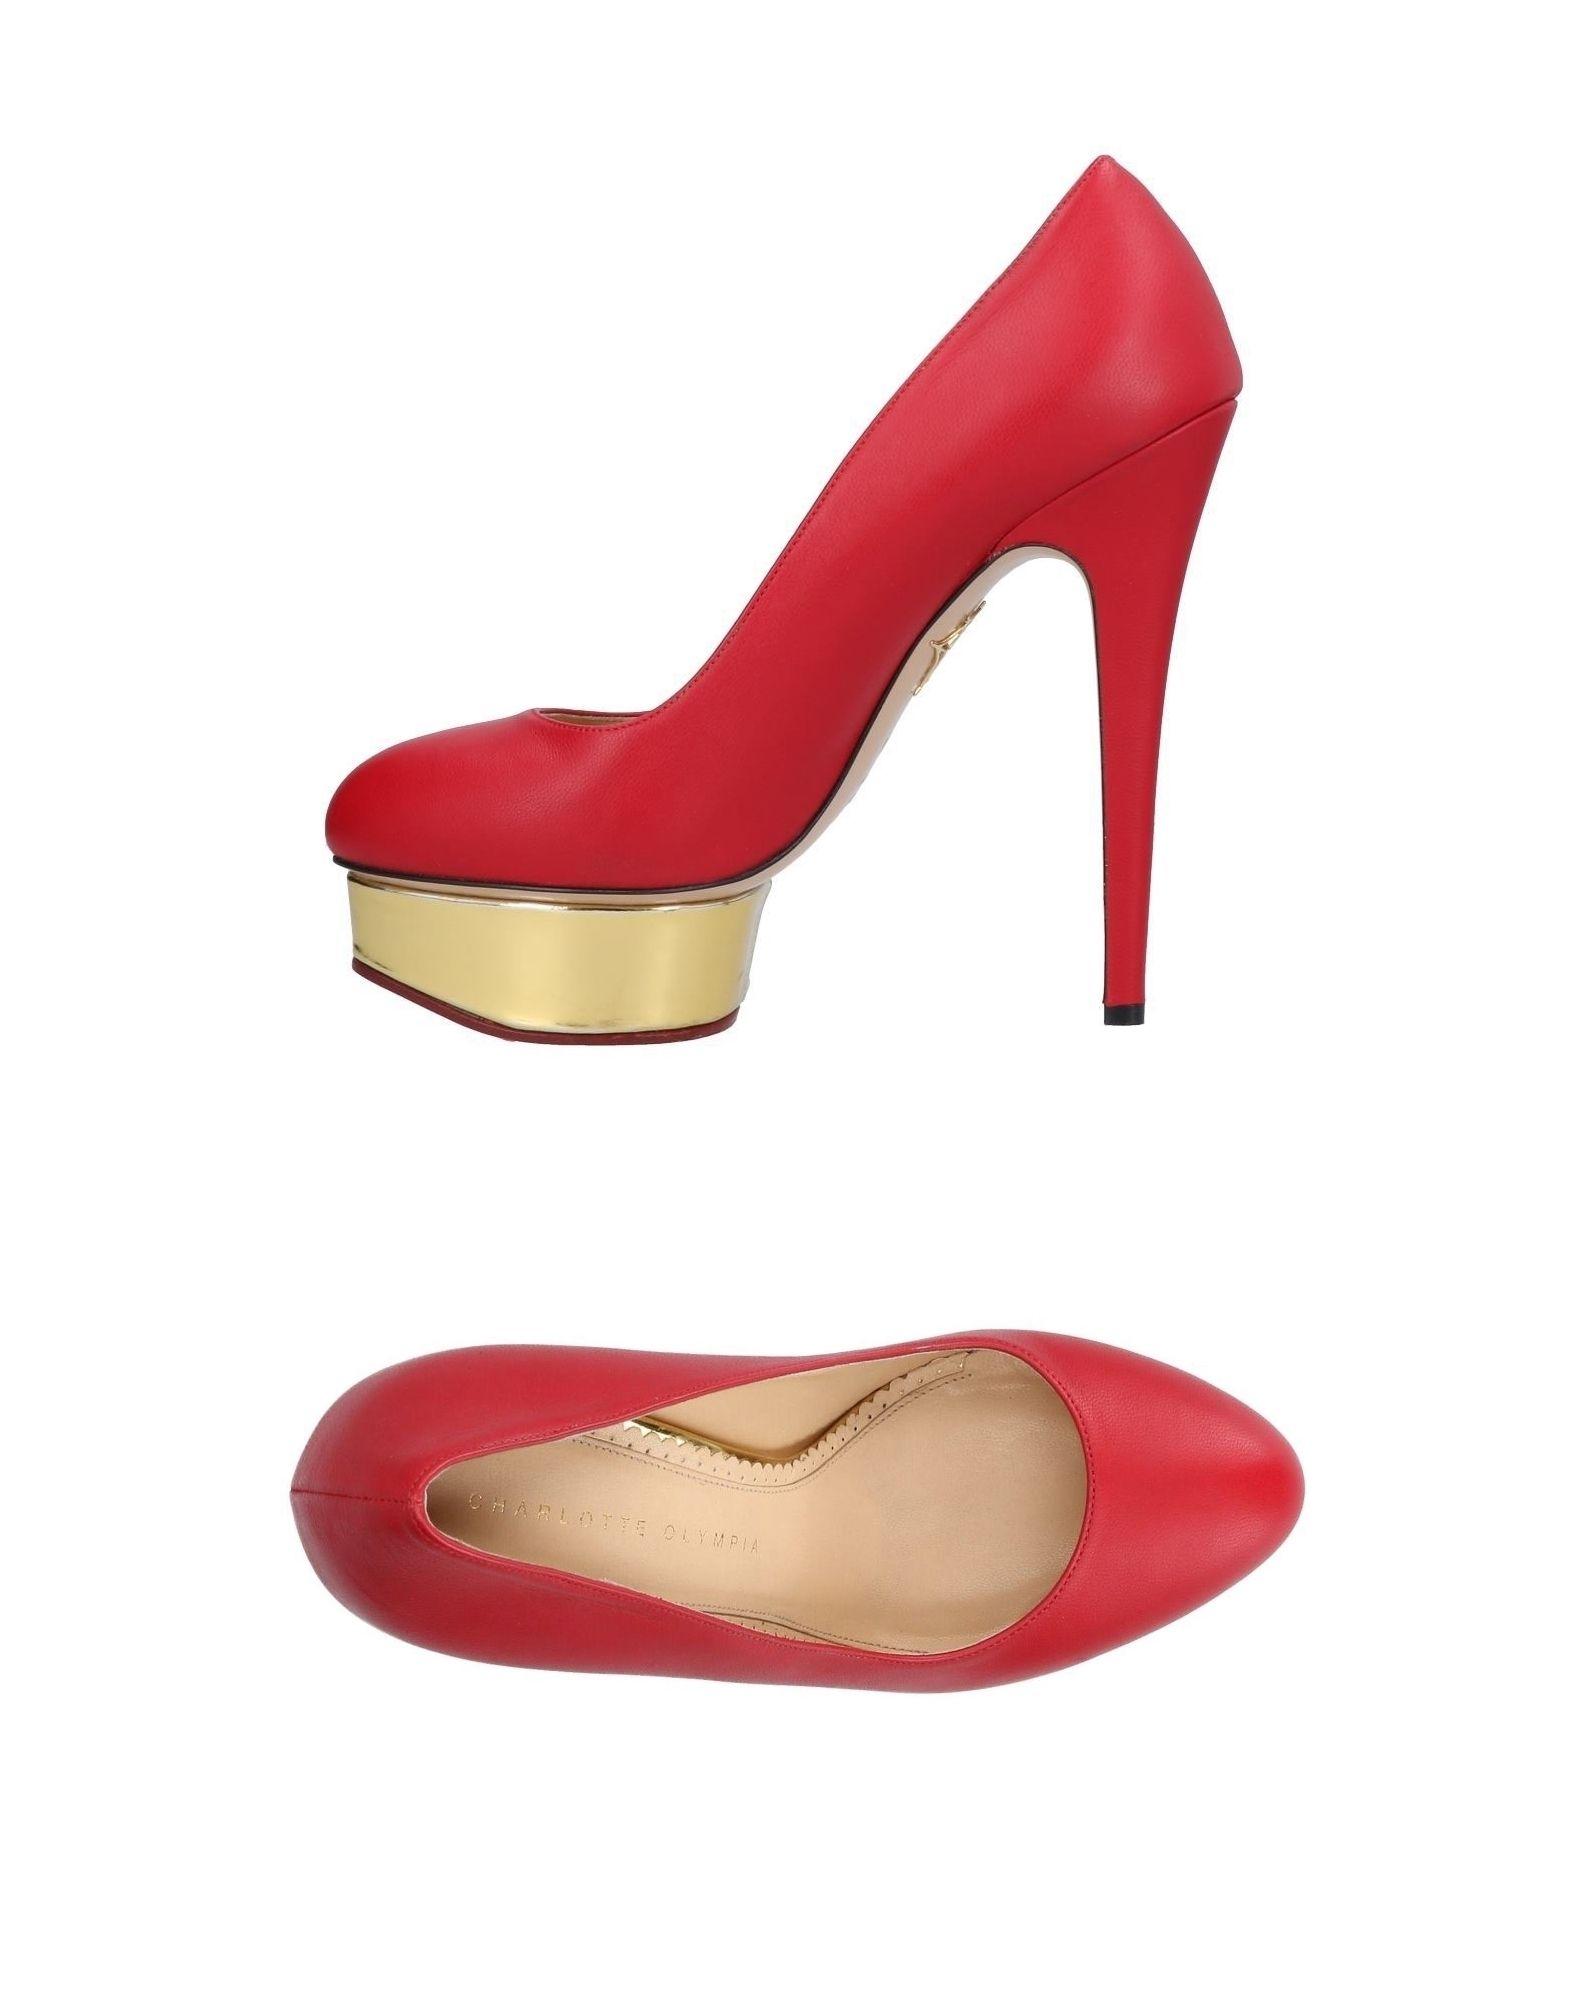 Charlotte Olympia Pumps Damen  11461078EAGut aussehende strapazierfähige Schuhe